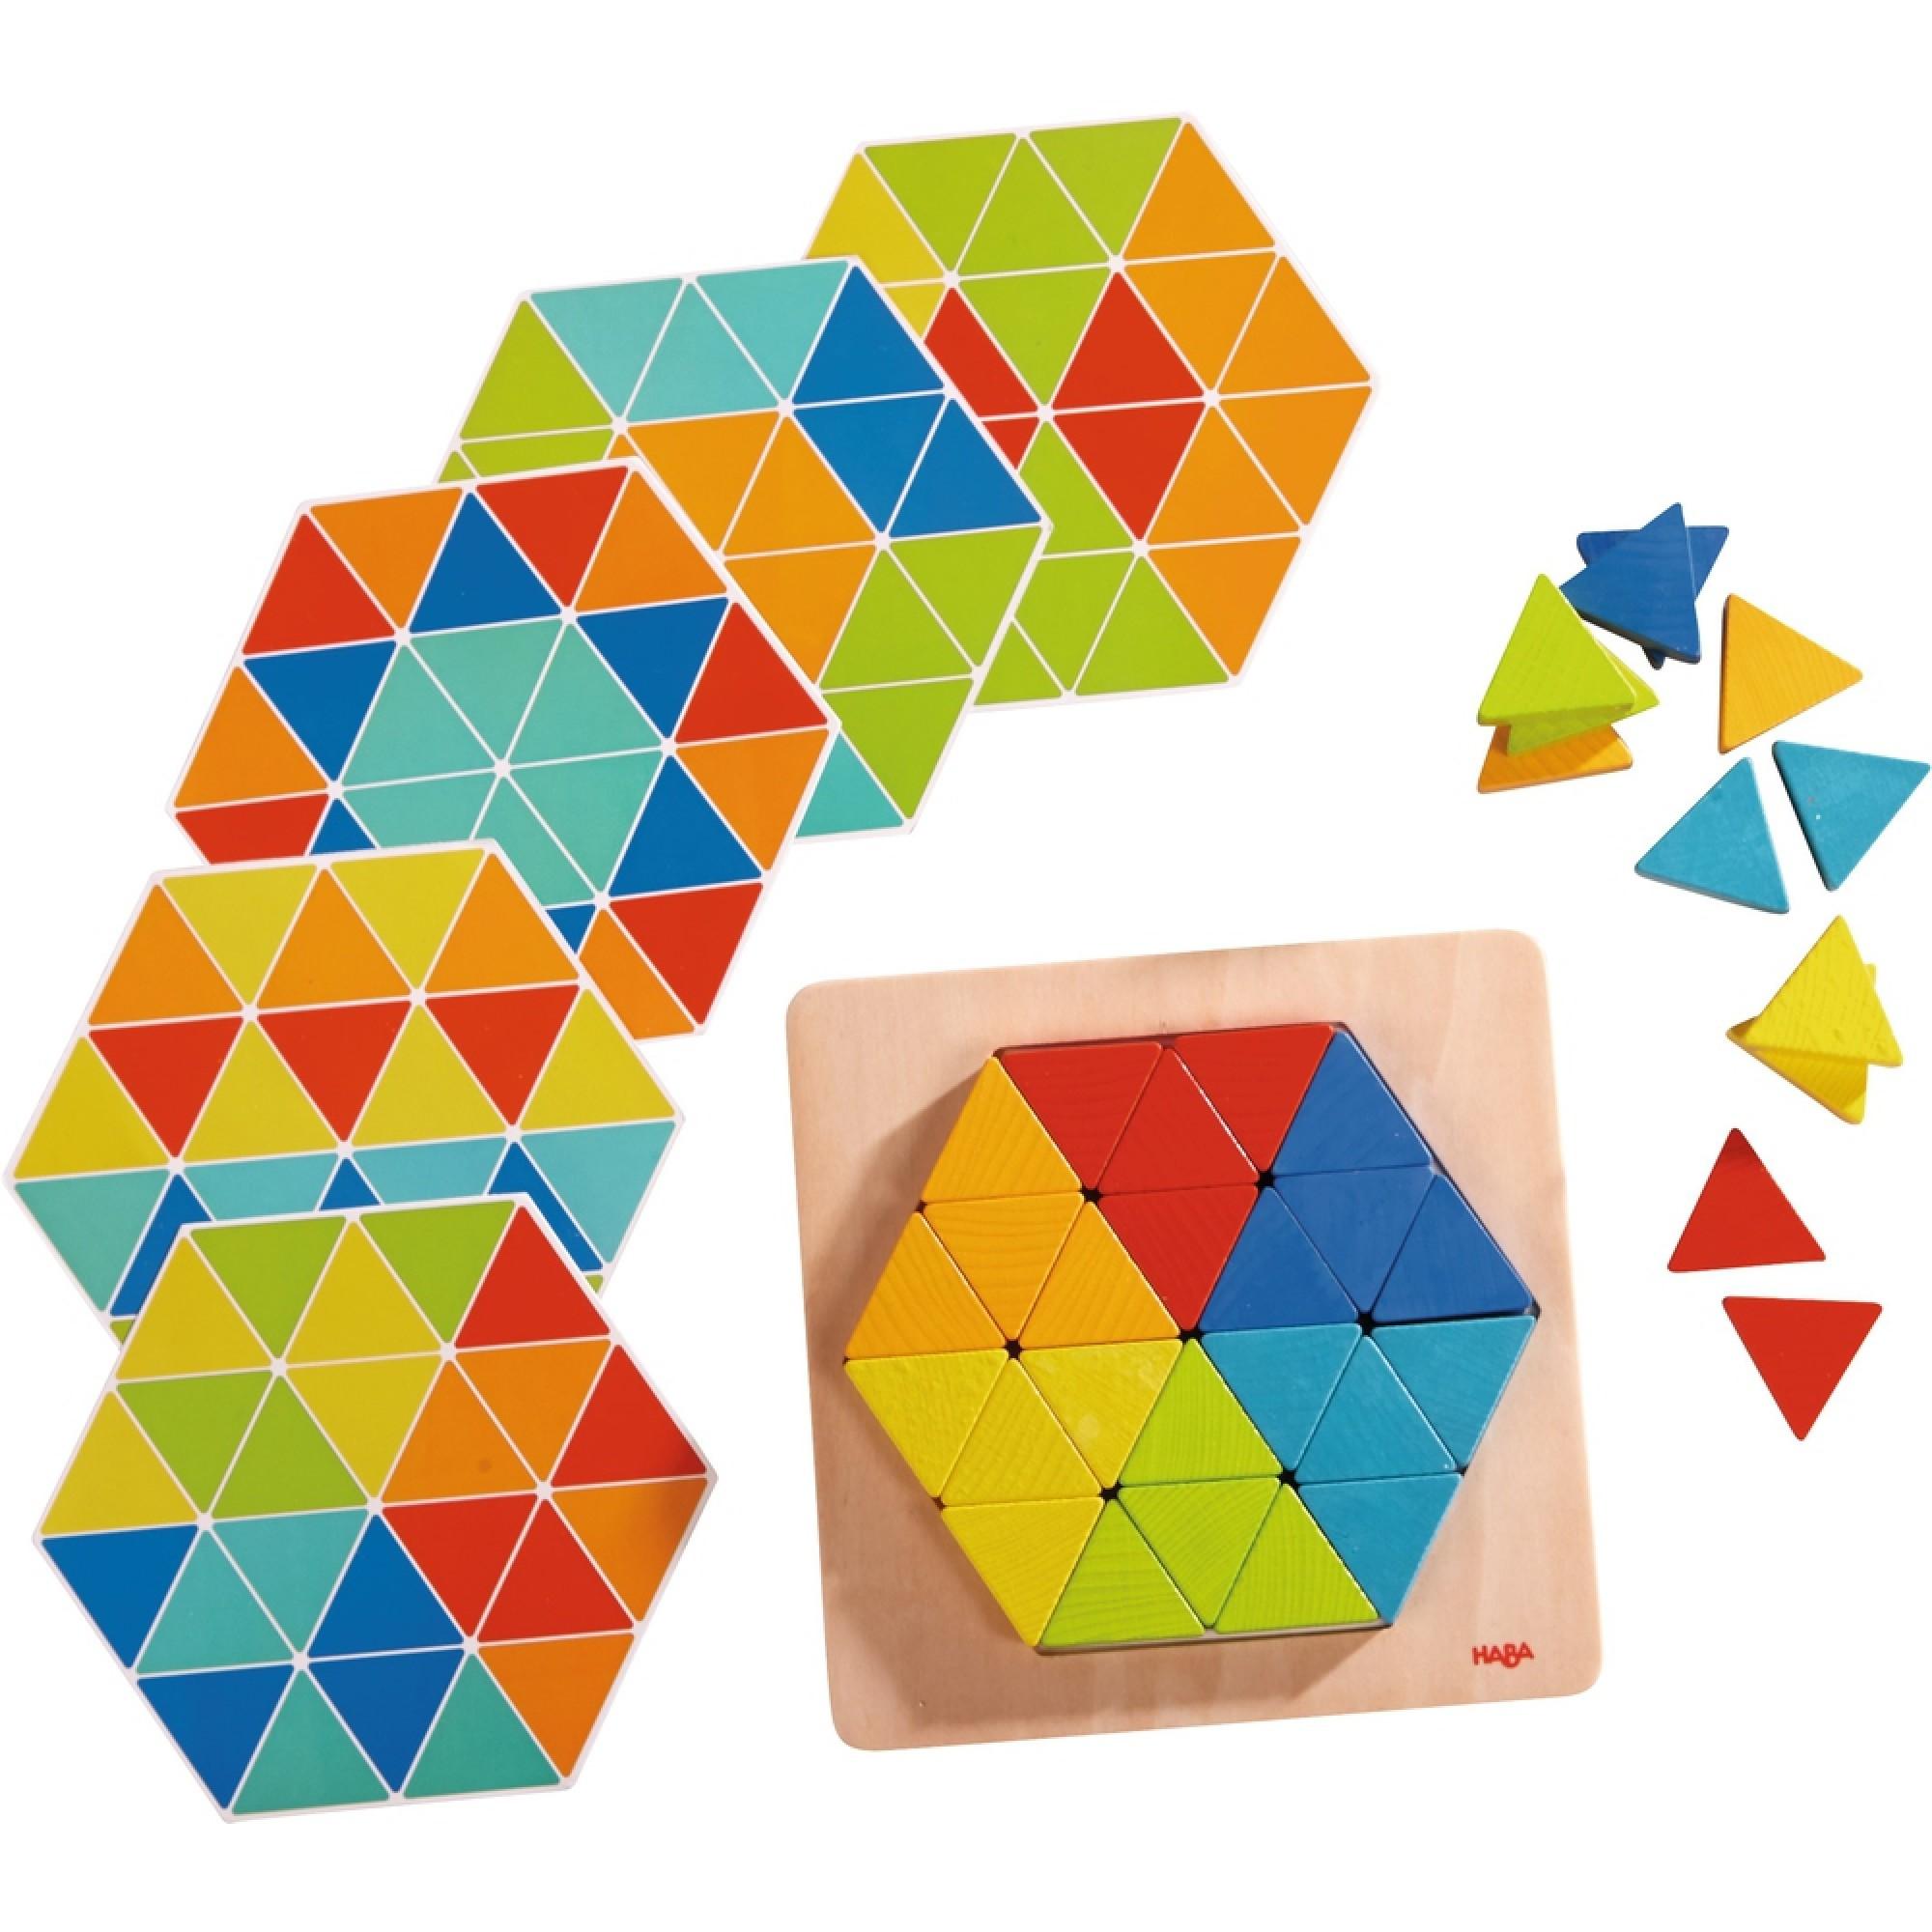 Joc de aranjare Haba, Piramidele magice, 2ani+